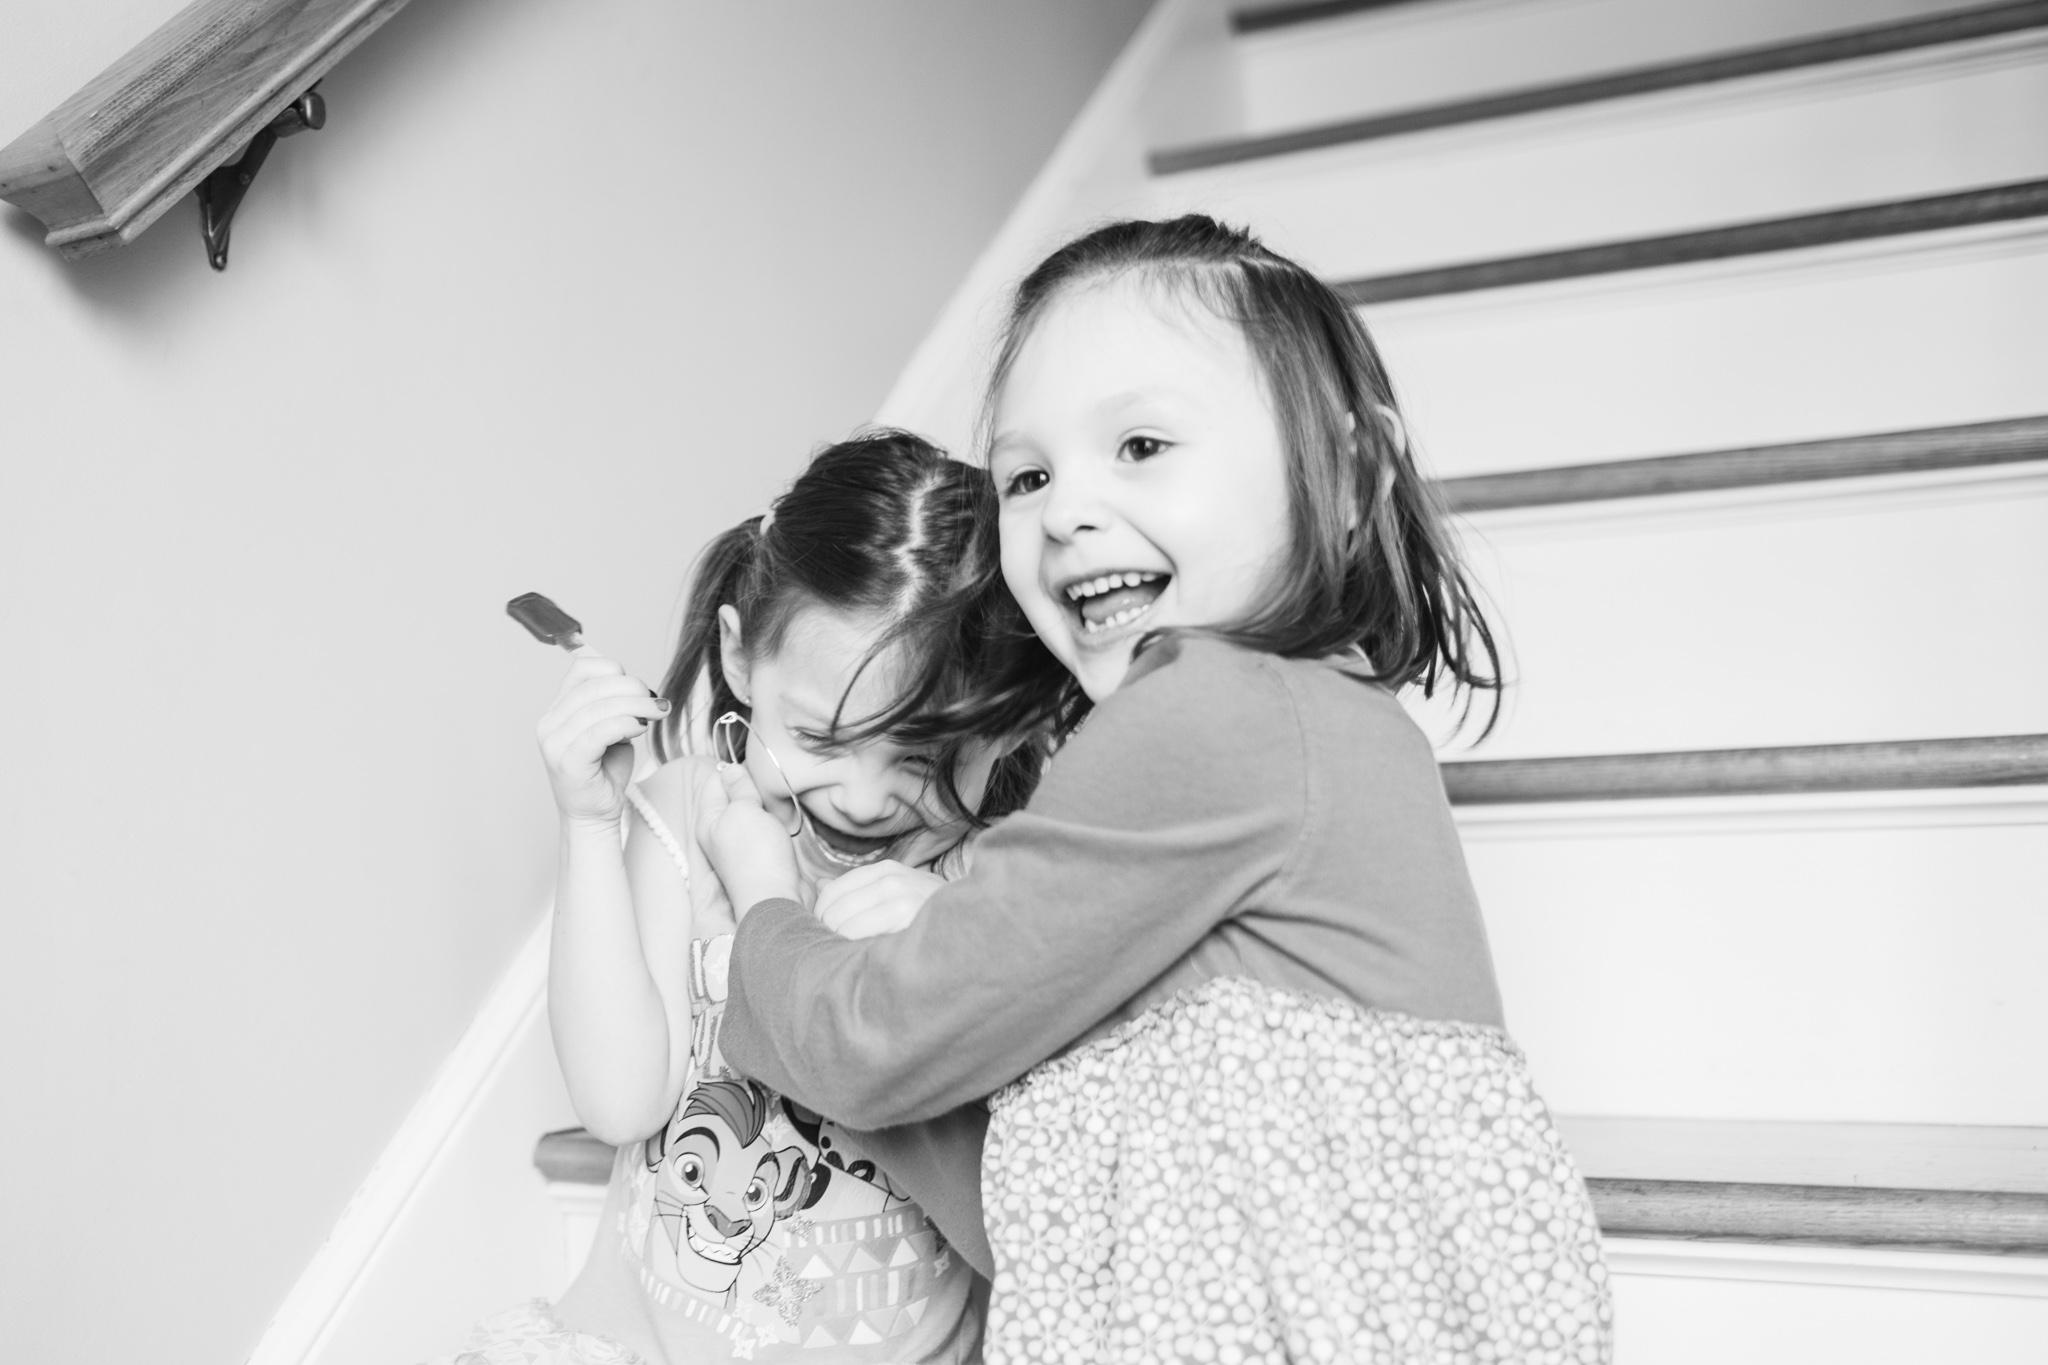 Ma_family_photographer_Kidsportraits-2.jpg